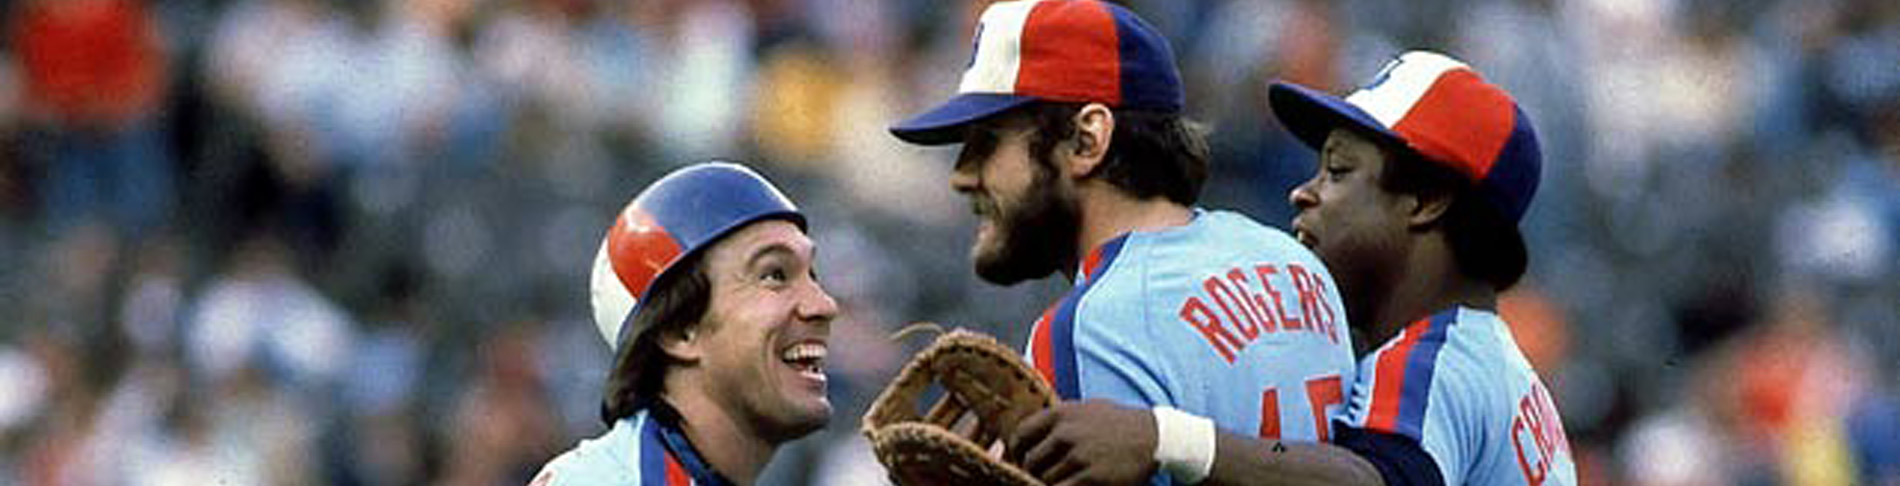 Montreal Expos Gary Carter and Steve Rogers victorious.Credit: Heinz KluetmeierSetNumber: X24899 TK4 R6 F14